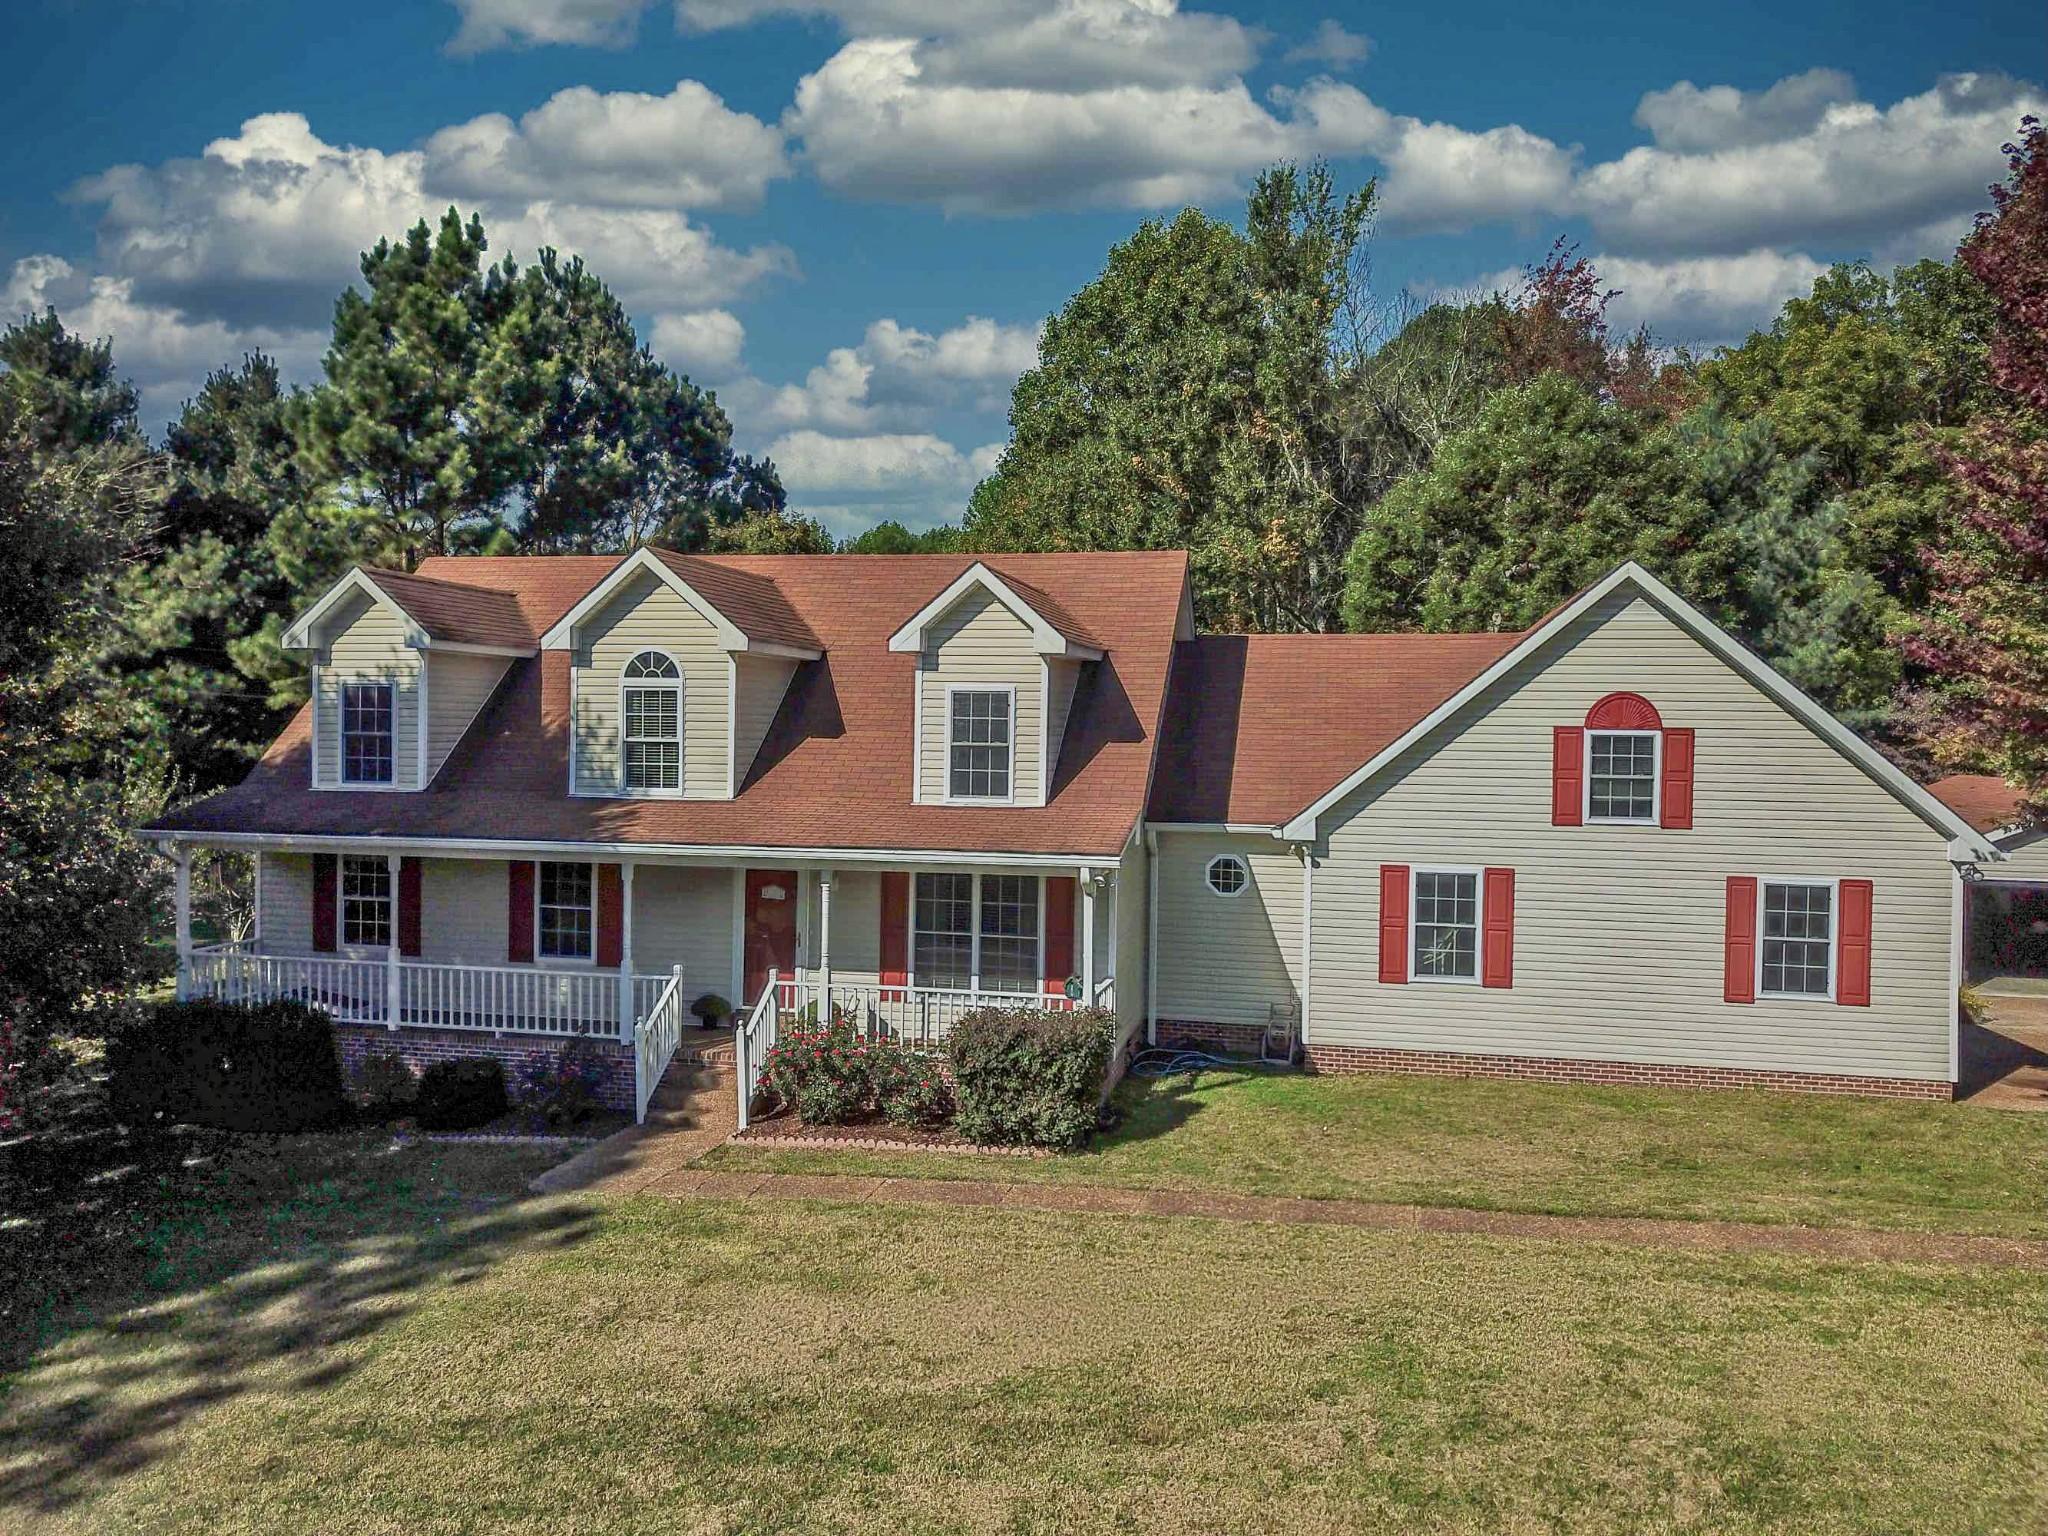 1059 N Corinth Rd Property Photo - Portland, TN real estate listing